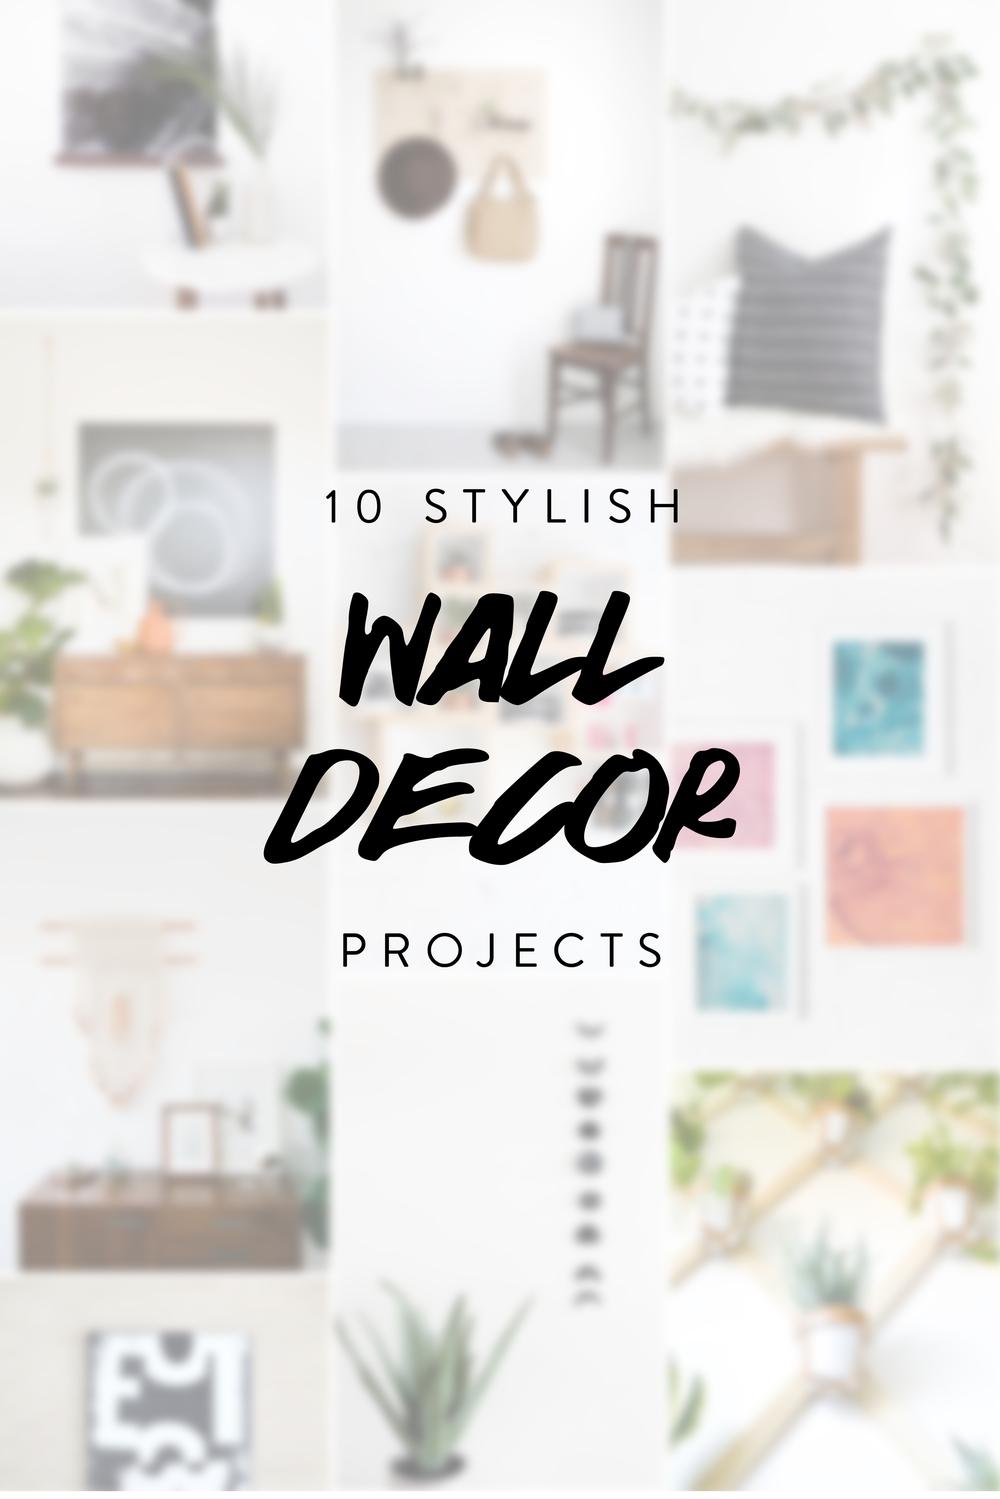 10 Stylish Wall Decor Projects